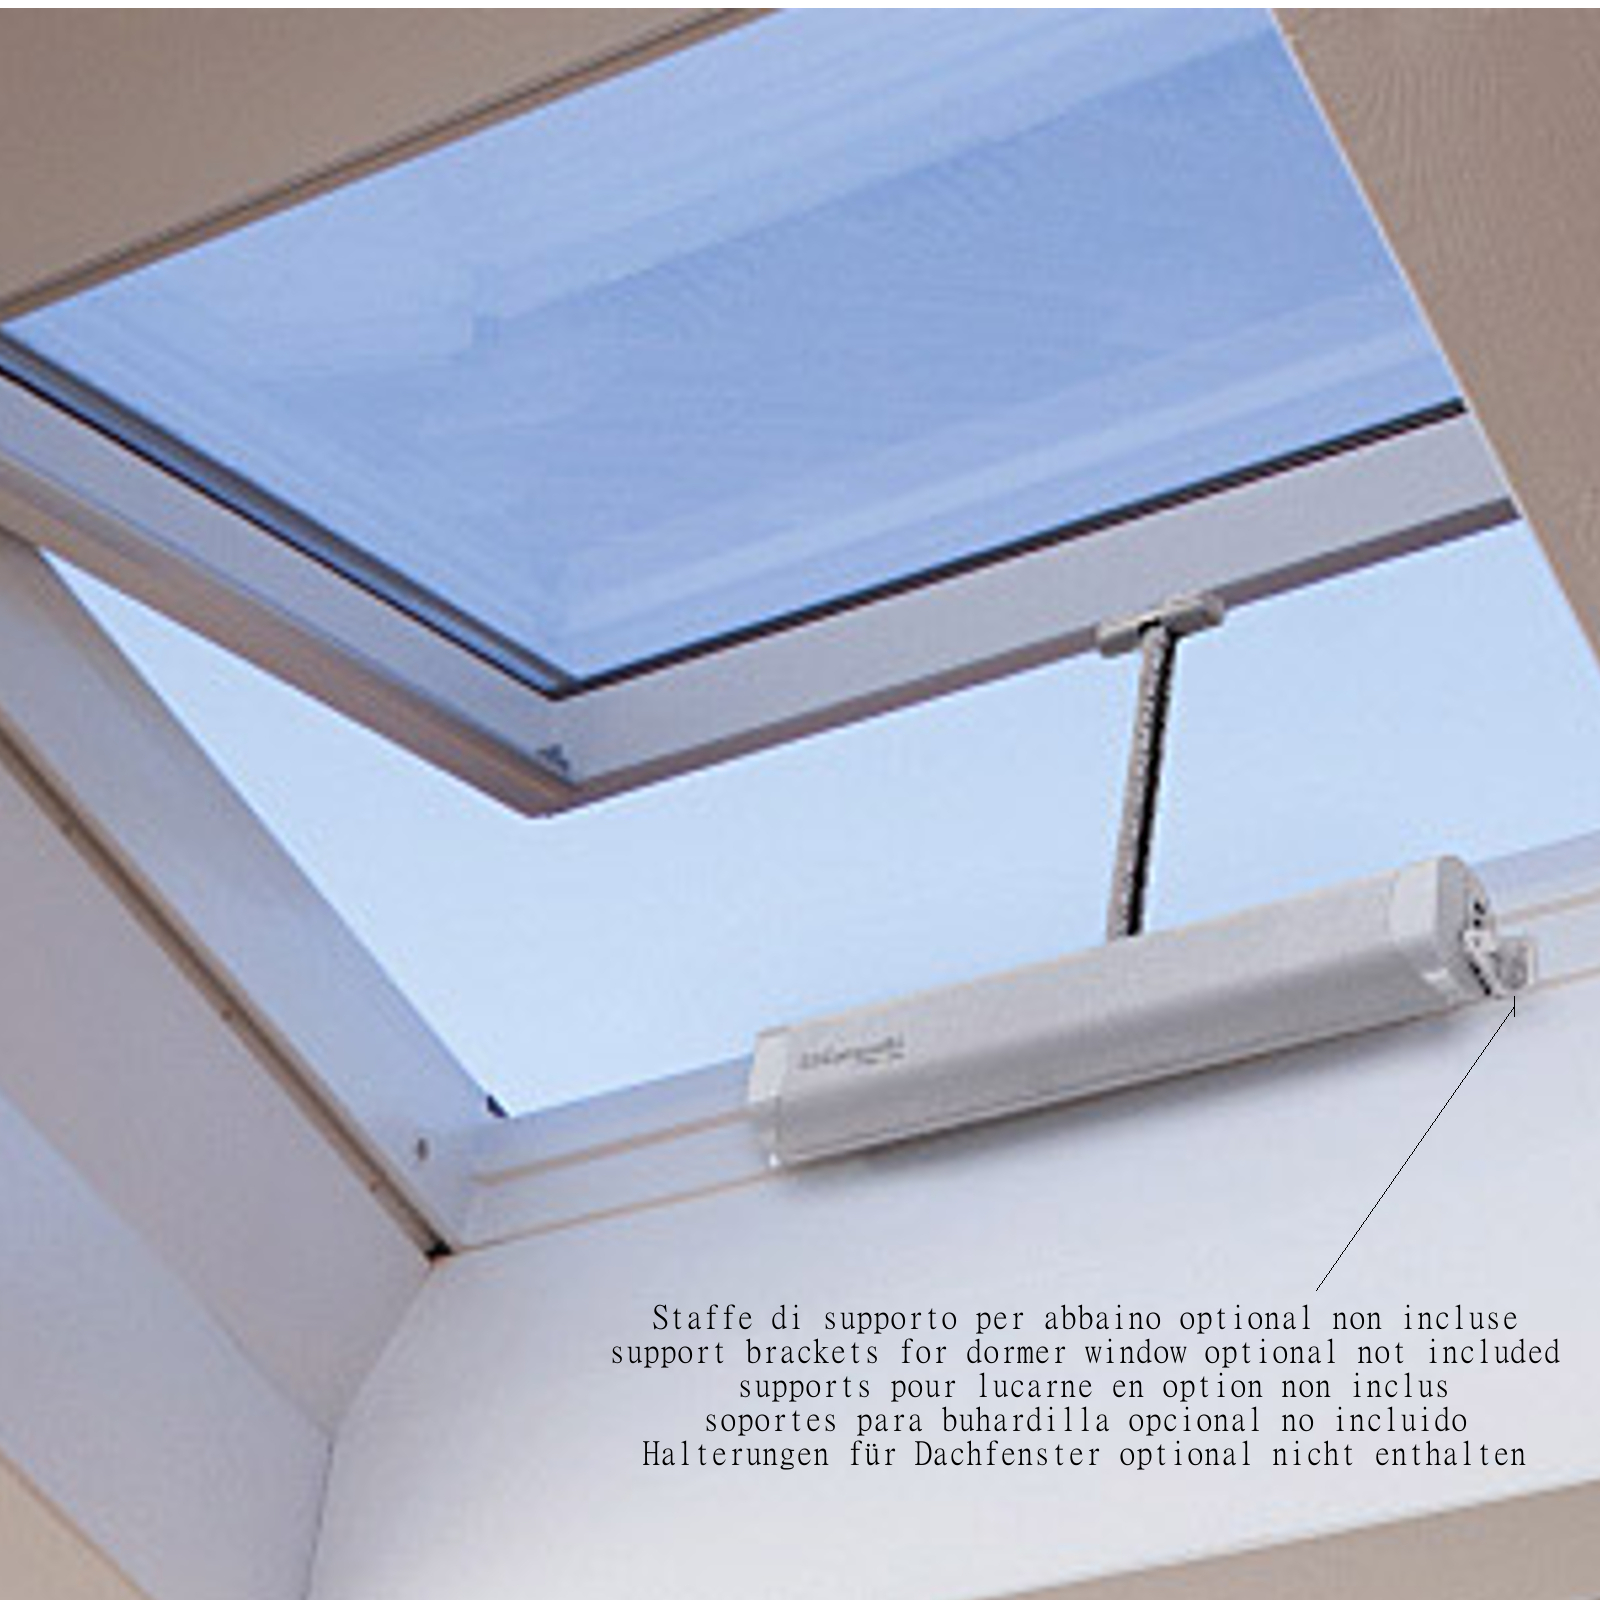 LIWIN 350N 230V BLACK Electric Window Openers Top Bottom Hung Shed Skylight